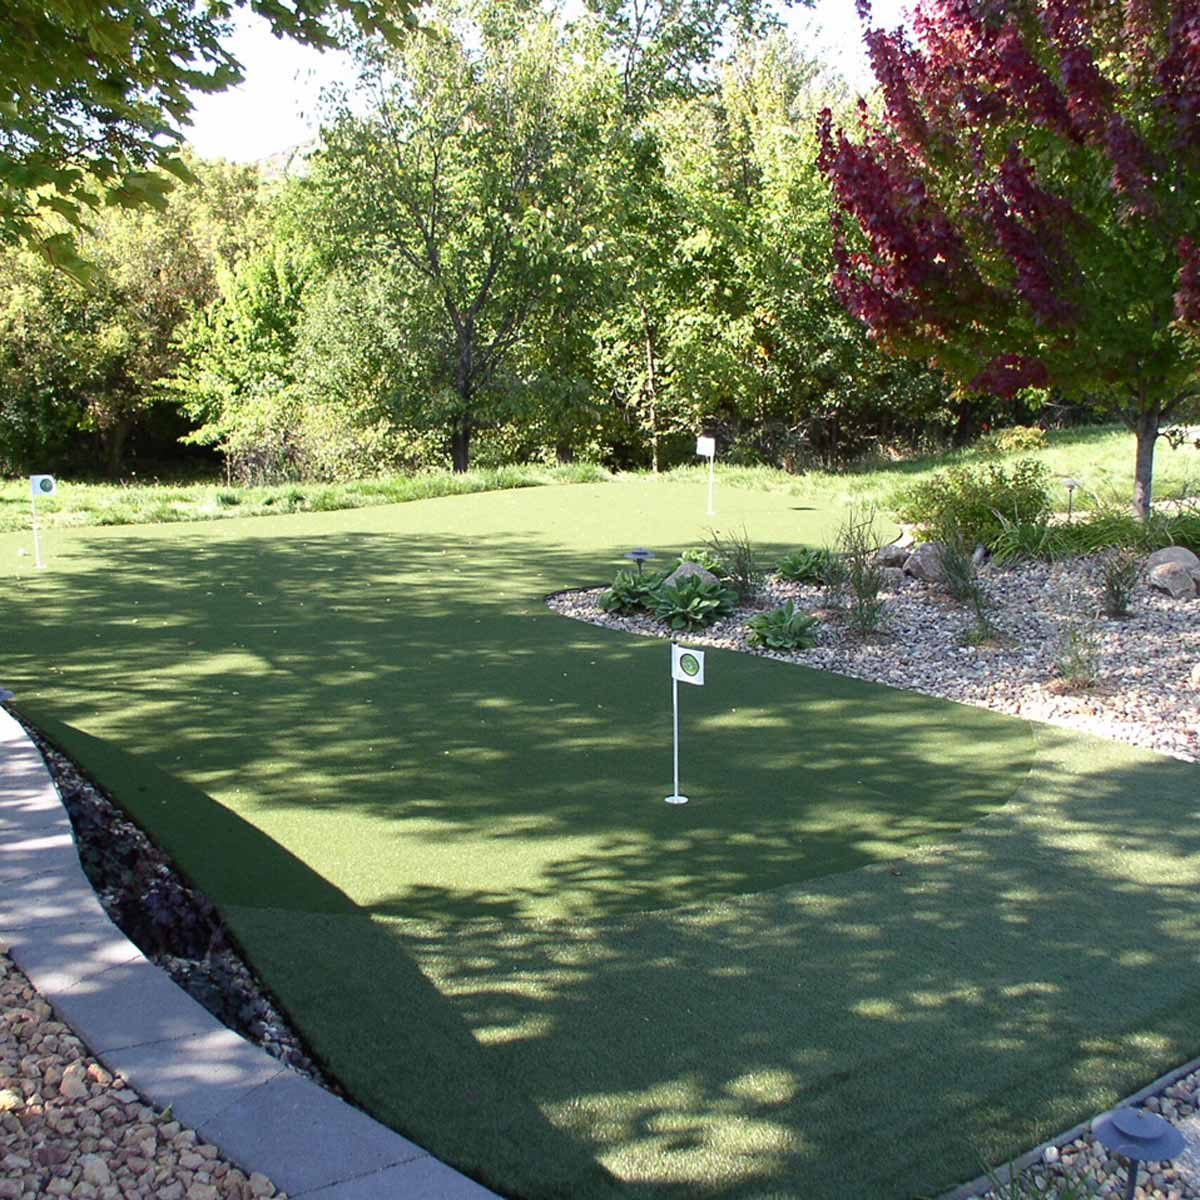 19 Crazy Cool Backyard Putting Greens — The Family Handyman on Putting Green Ideas For Backyard id=87364